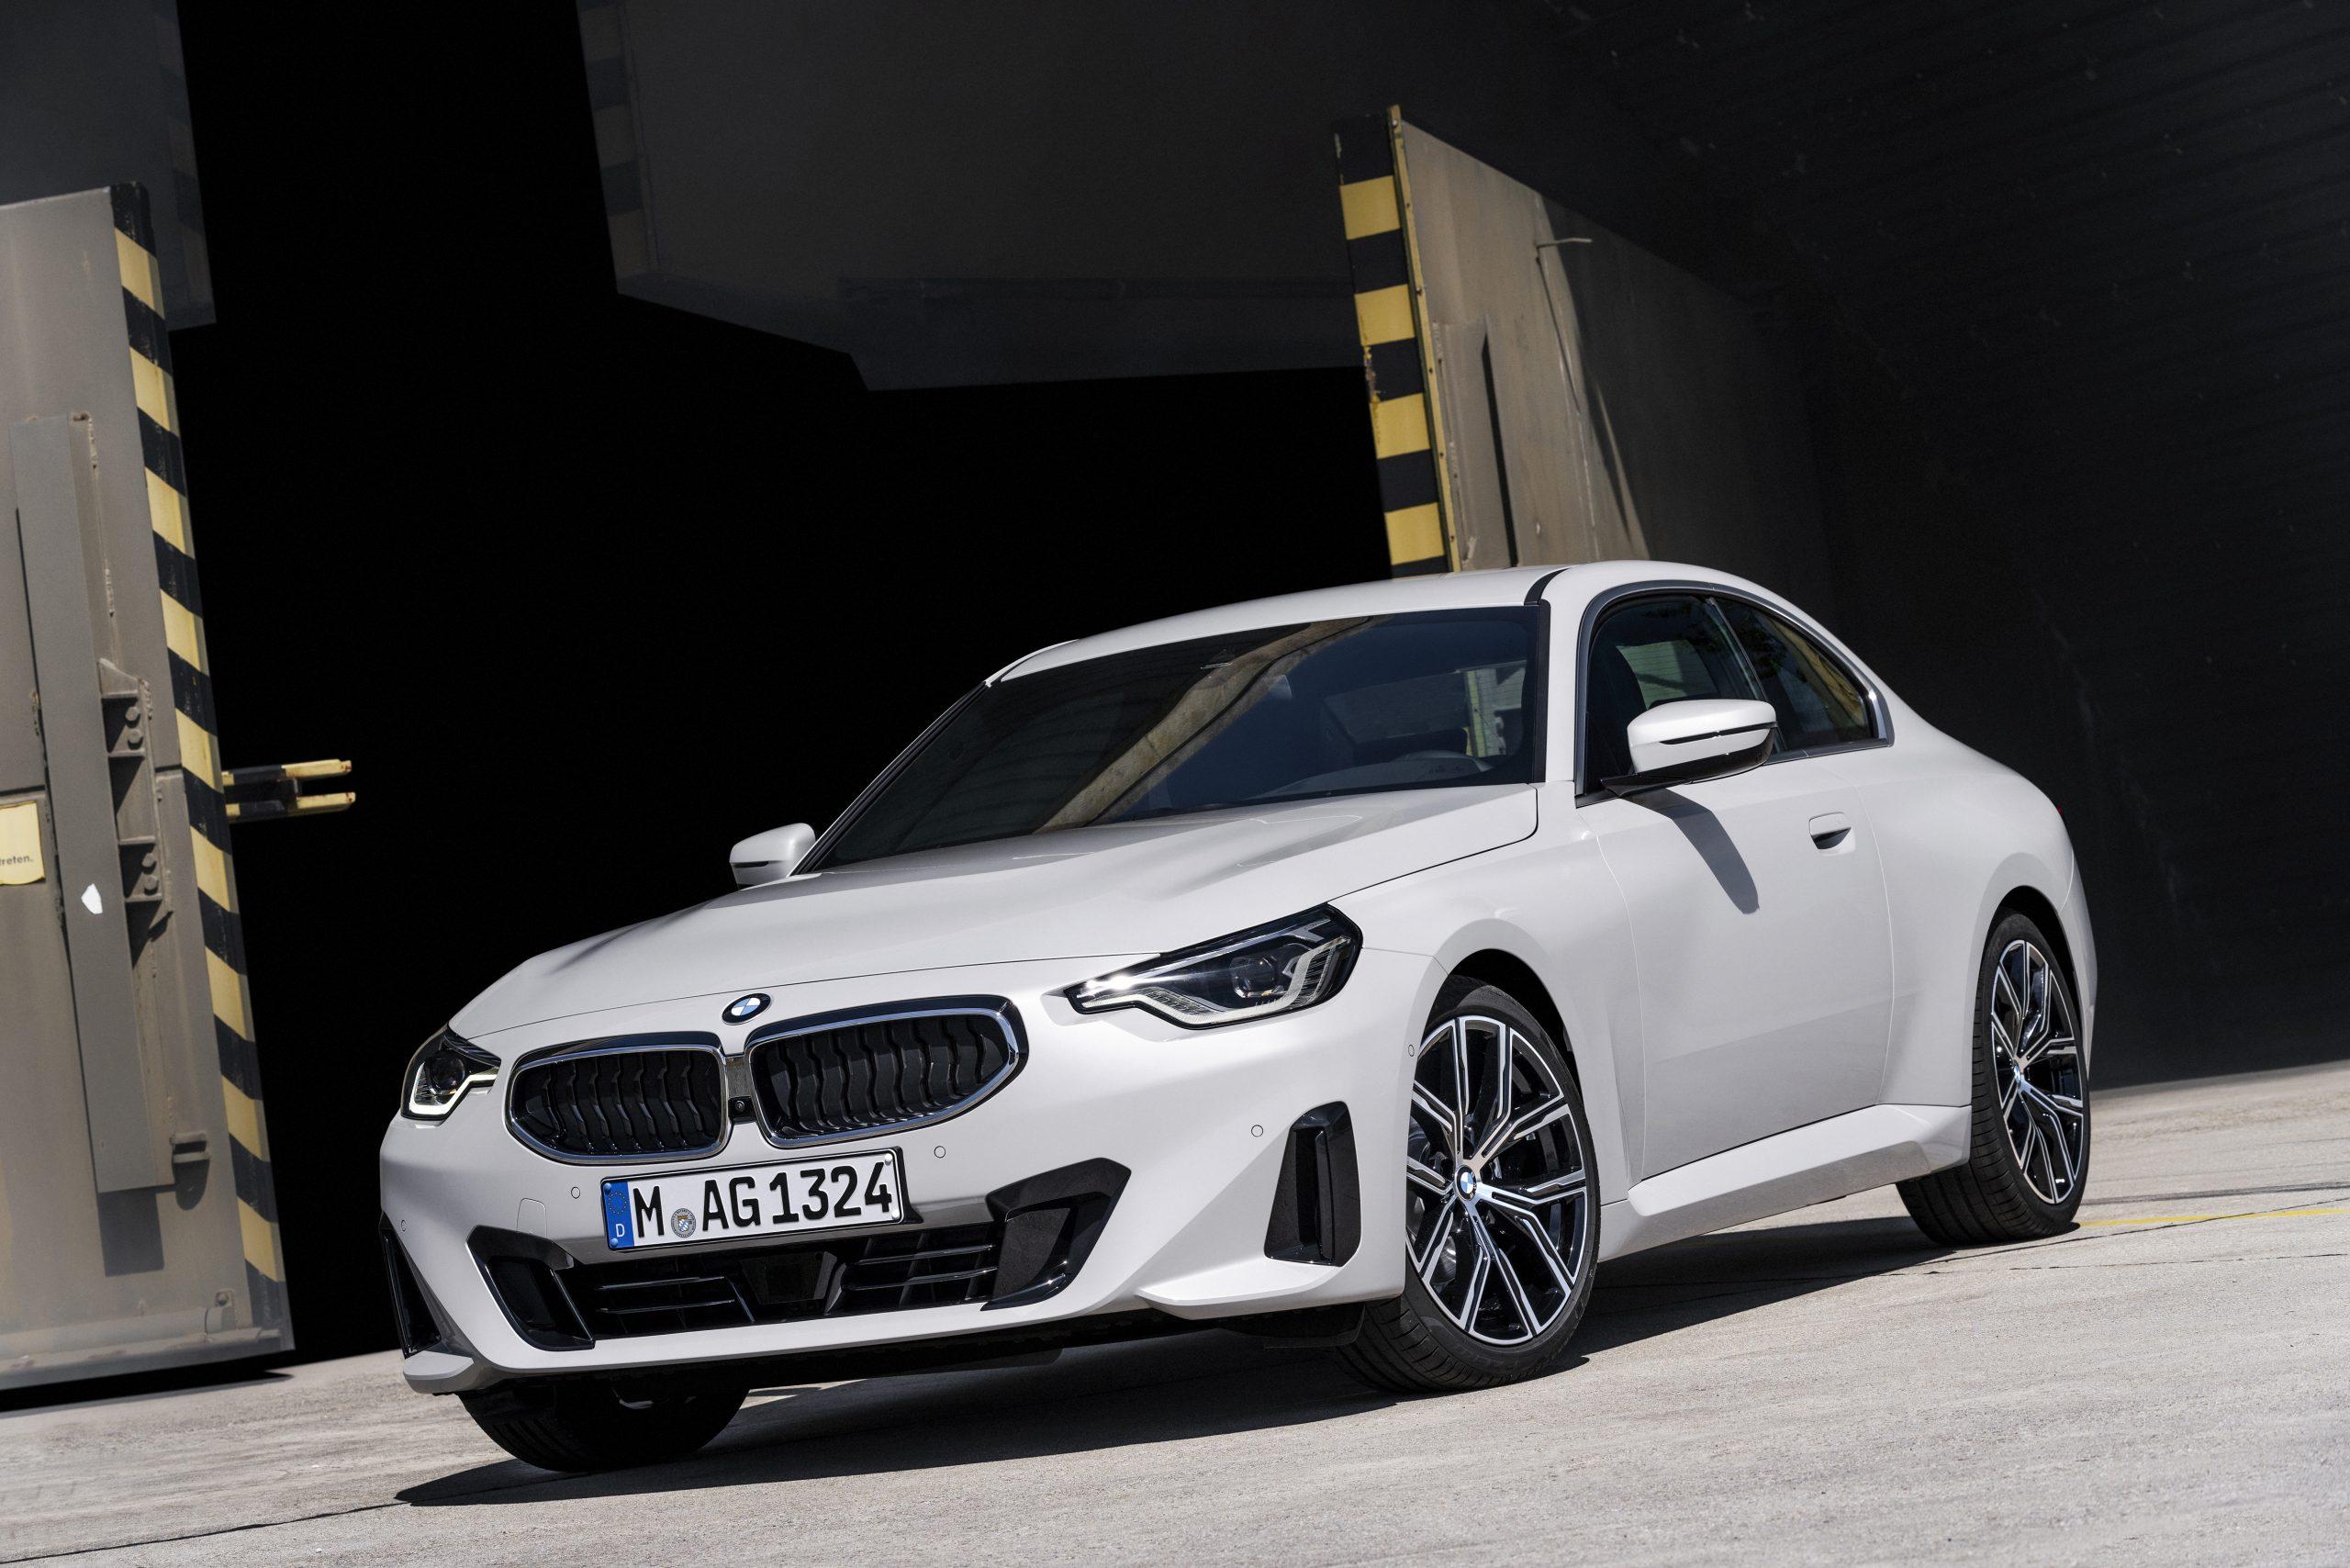 P90428416 highRes scaled Αυτή είναι η νέα BMW Σειρά 2 Coupe BMW, Bmw 2, BMW Σειρά 2, zblog, ειδήσεις, Νέα, Σειρά 2